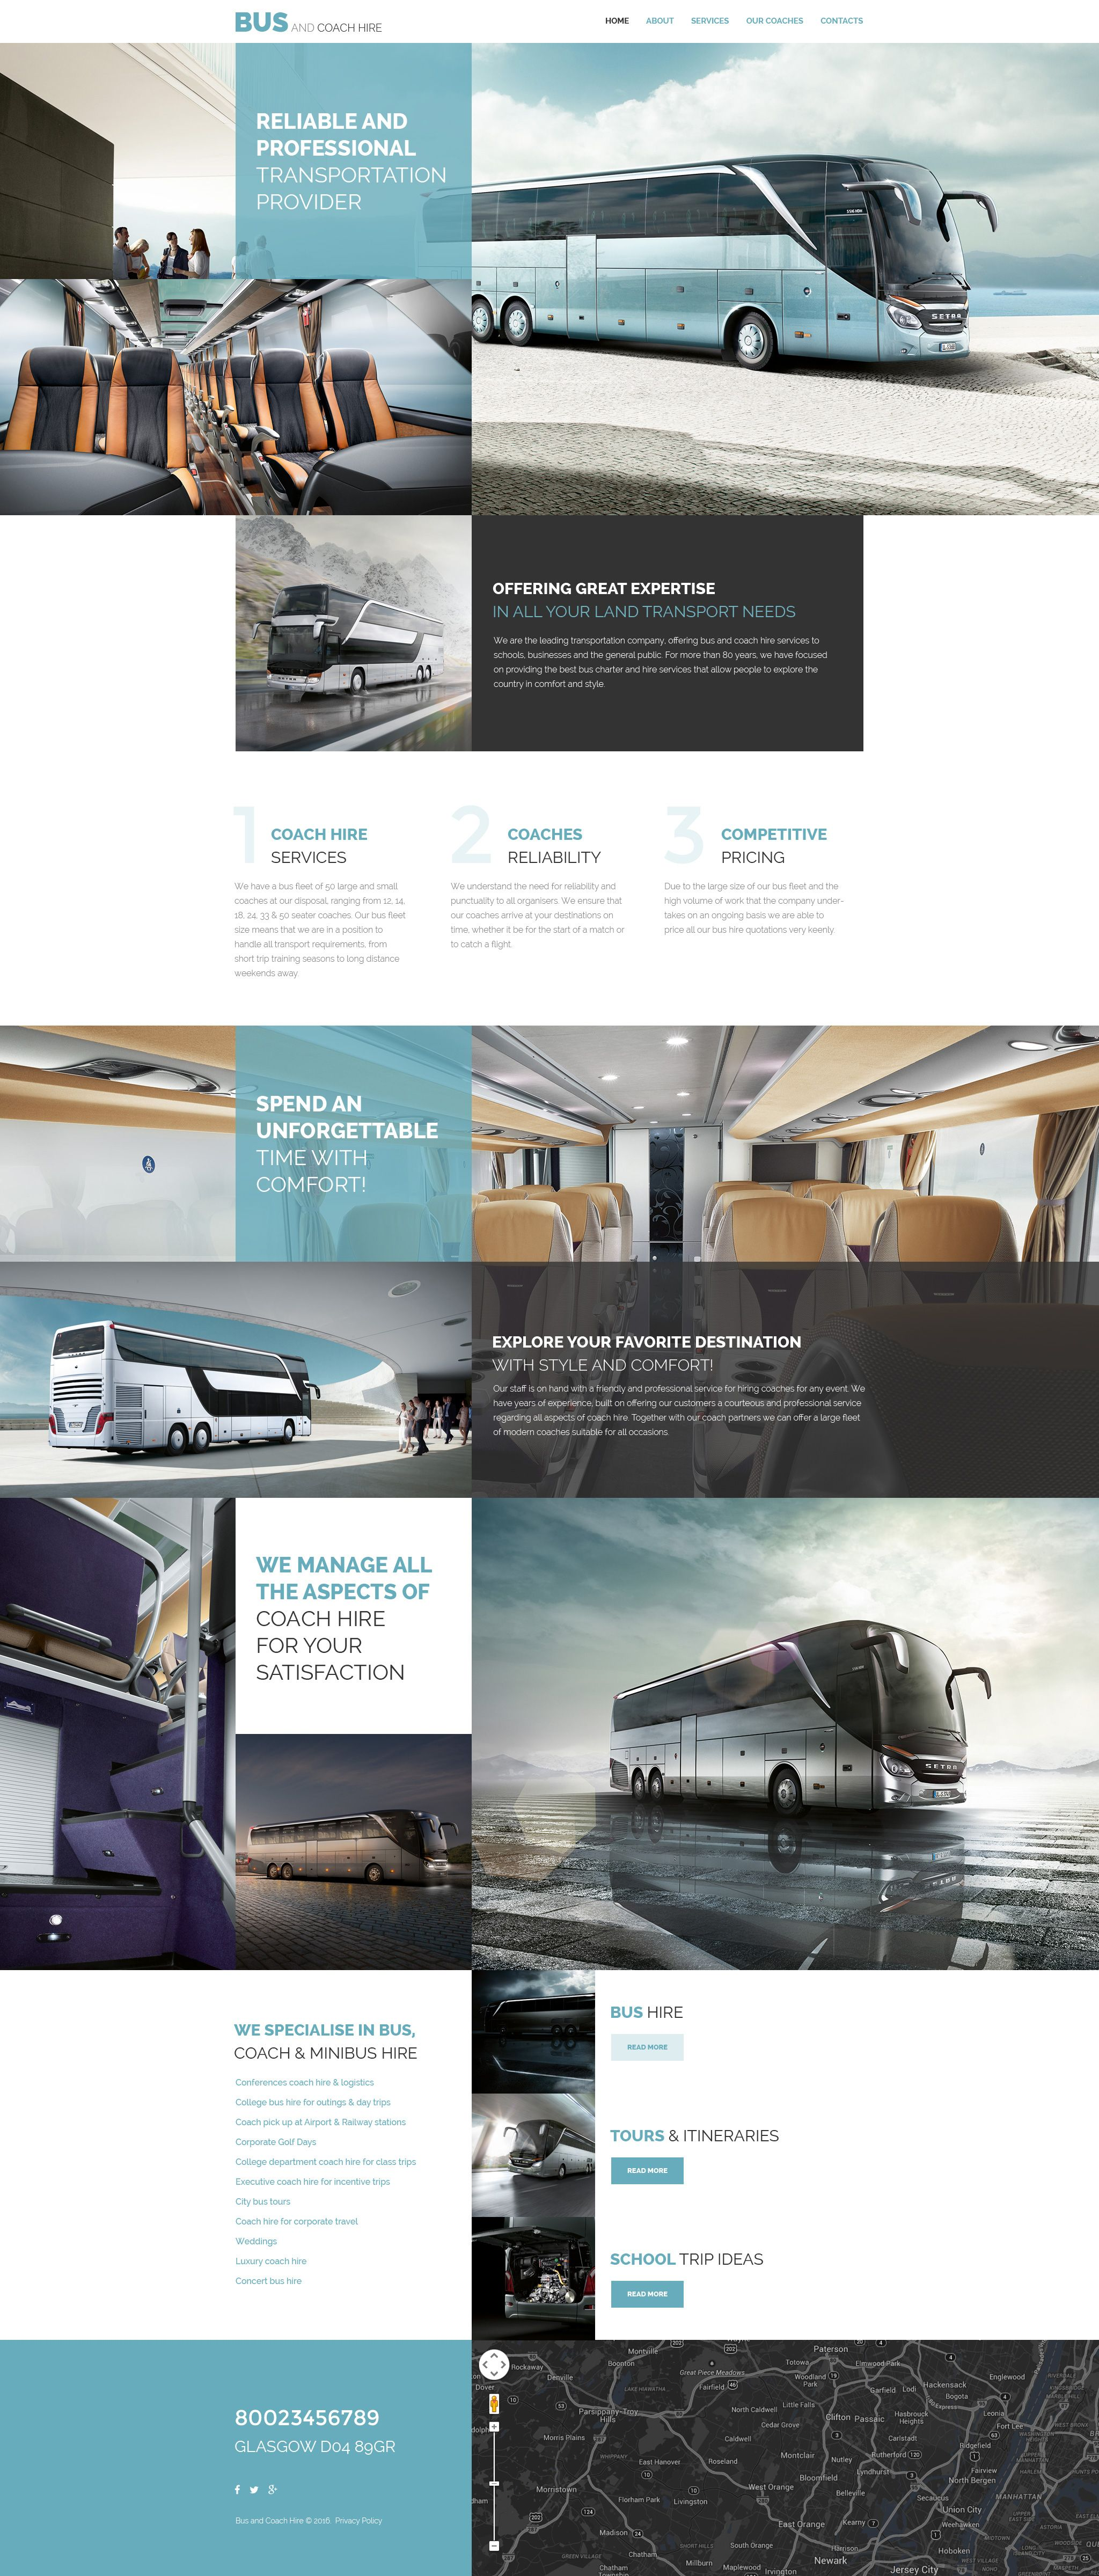 bus and coach hire website template cols et id e. Black Bedroom Furniture Sets. Home Design Ideas